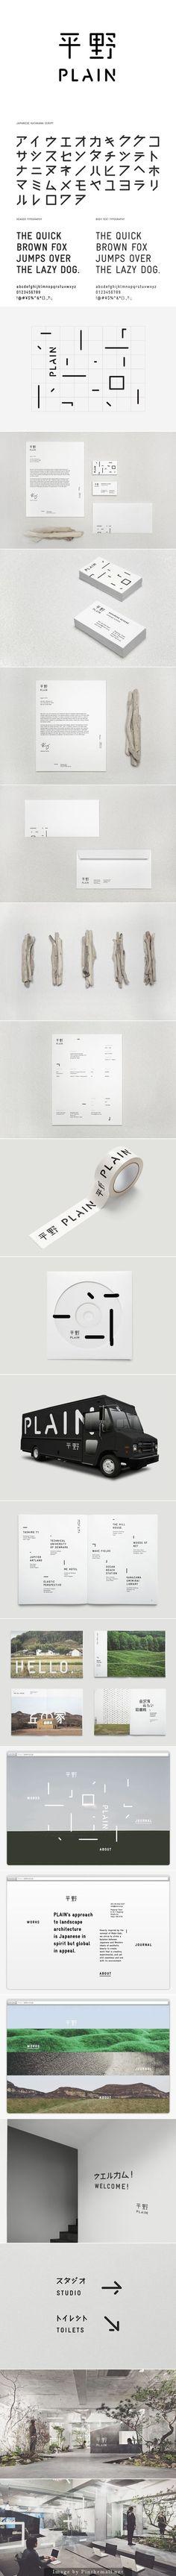 PLAIN by Sidney Lim YX, via Behance: